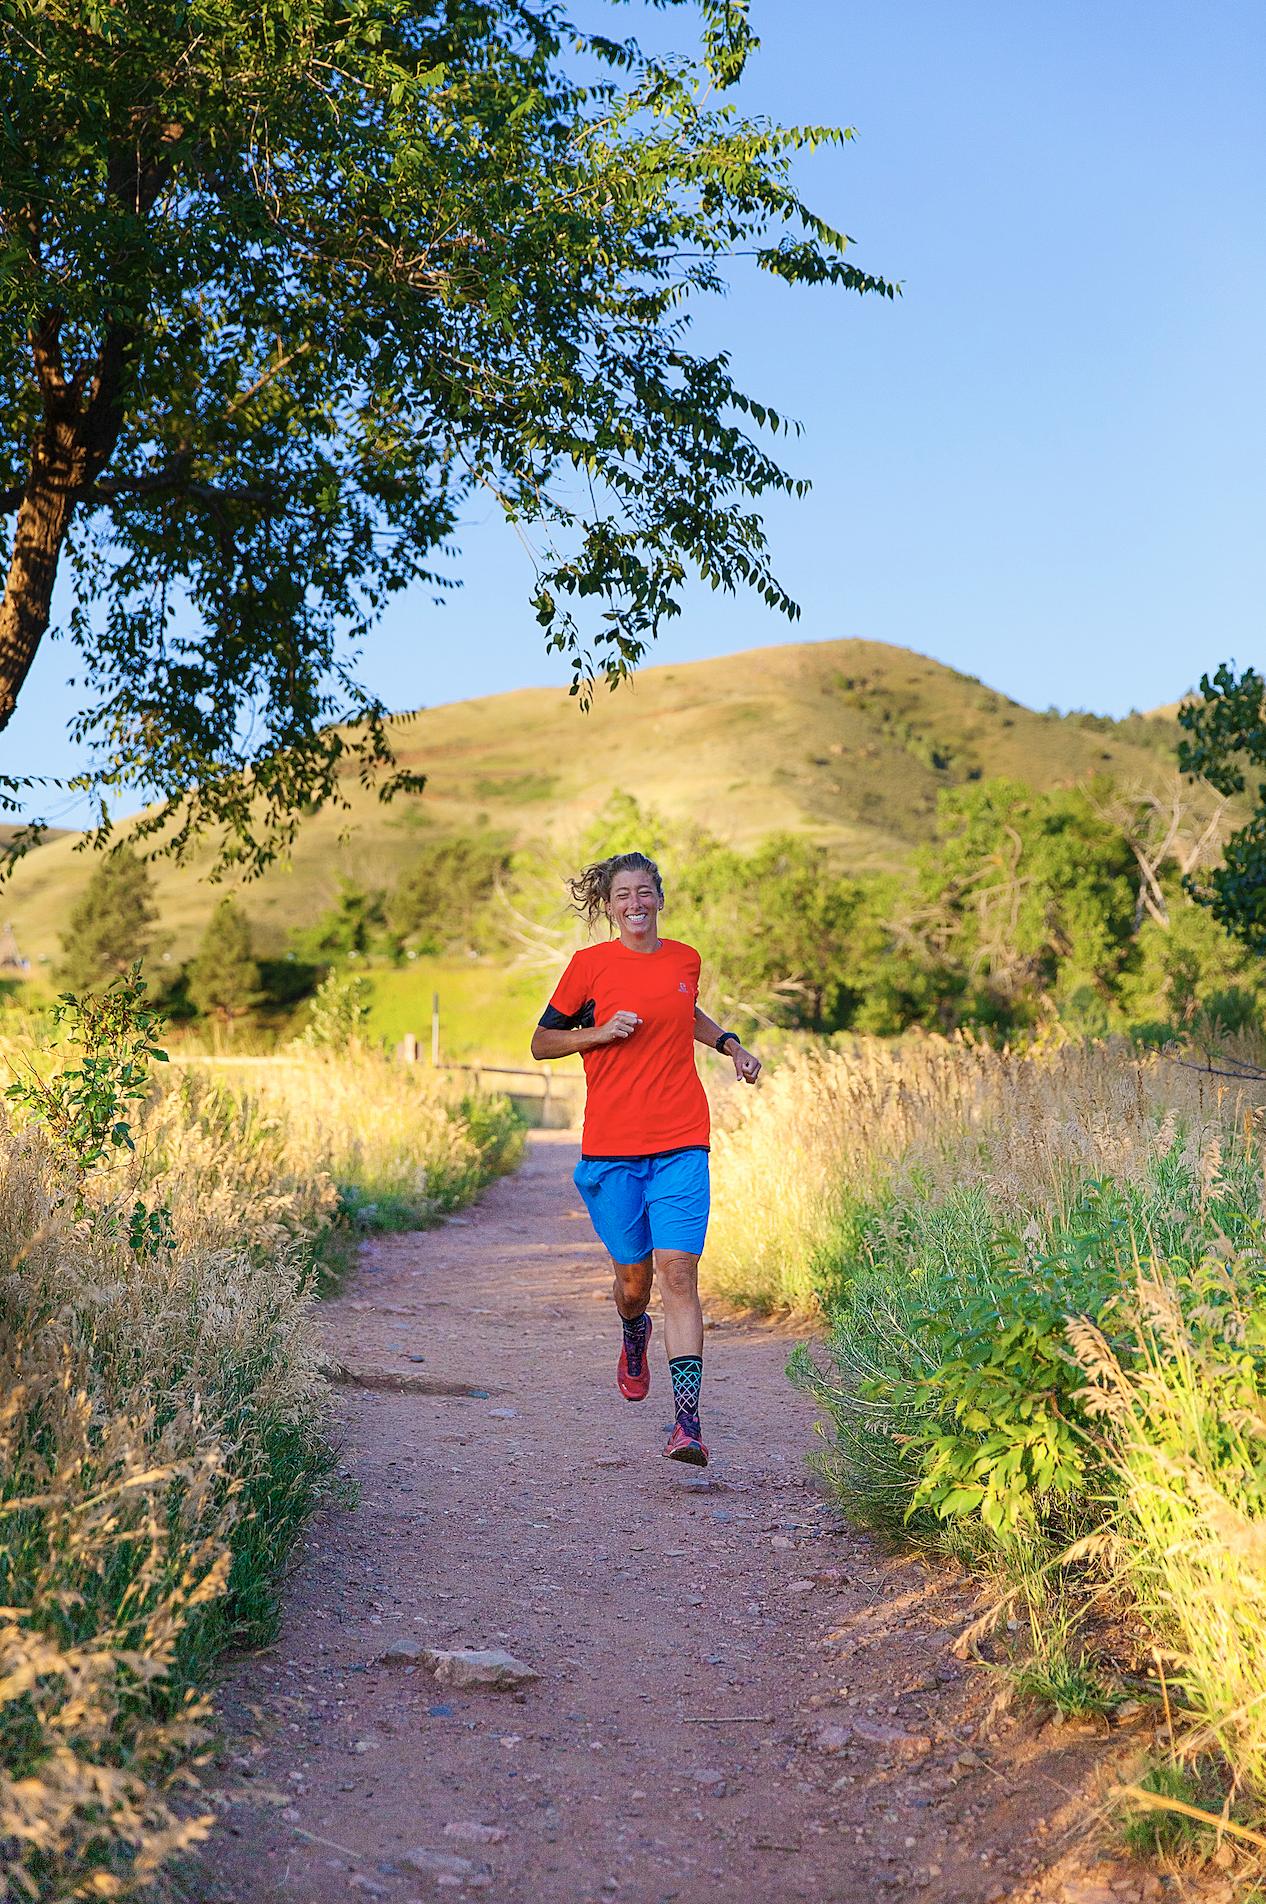 Courtney Dauwalter, Colorado, ultra runner champion, woman faster than men